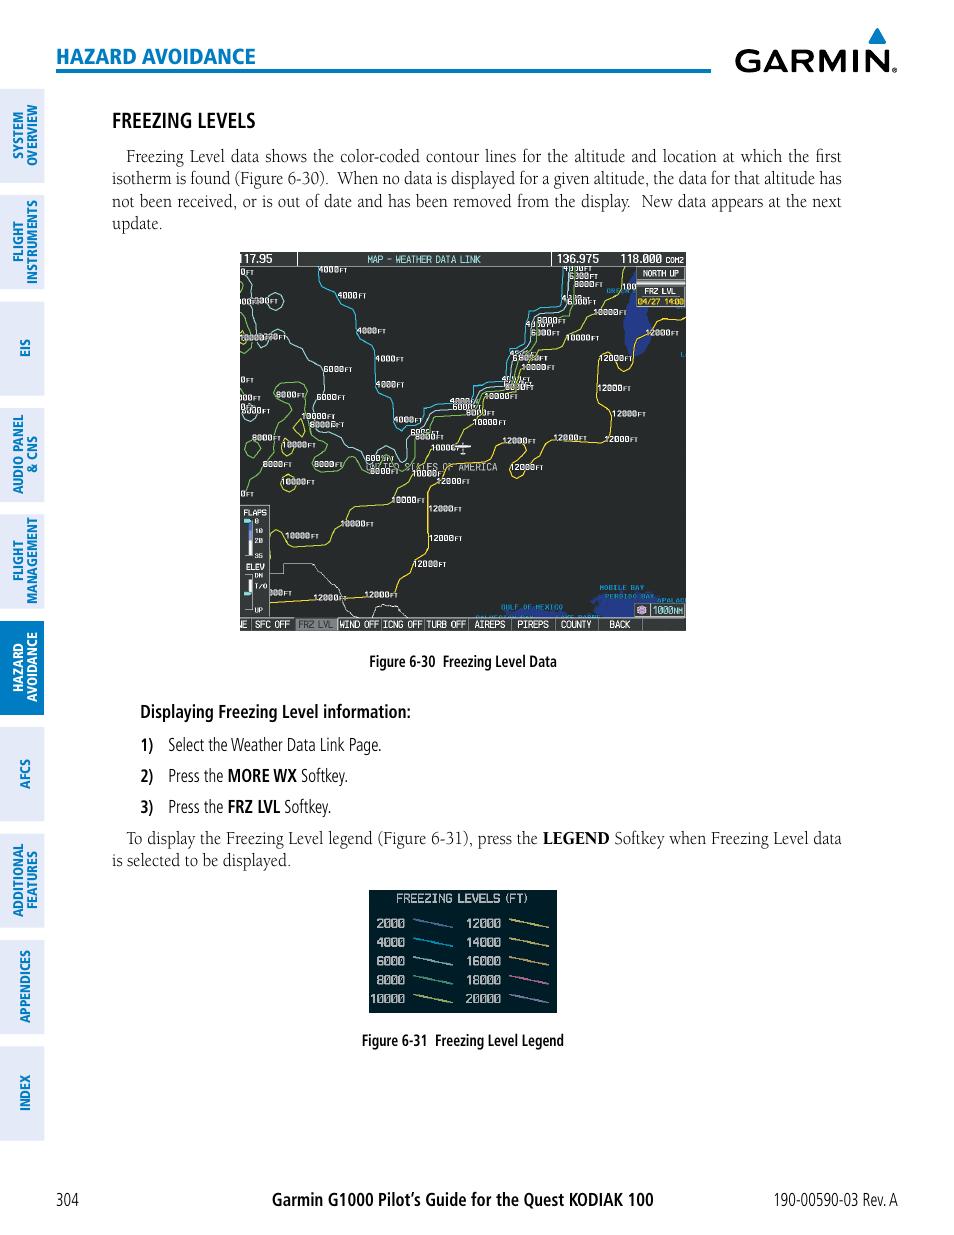 hazard avoidance freezing levels garmin g1000 quest kodiak user rh manualsdir com garmin 1000 owners manual garmin edge 1000 user manual pdf